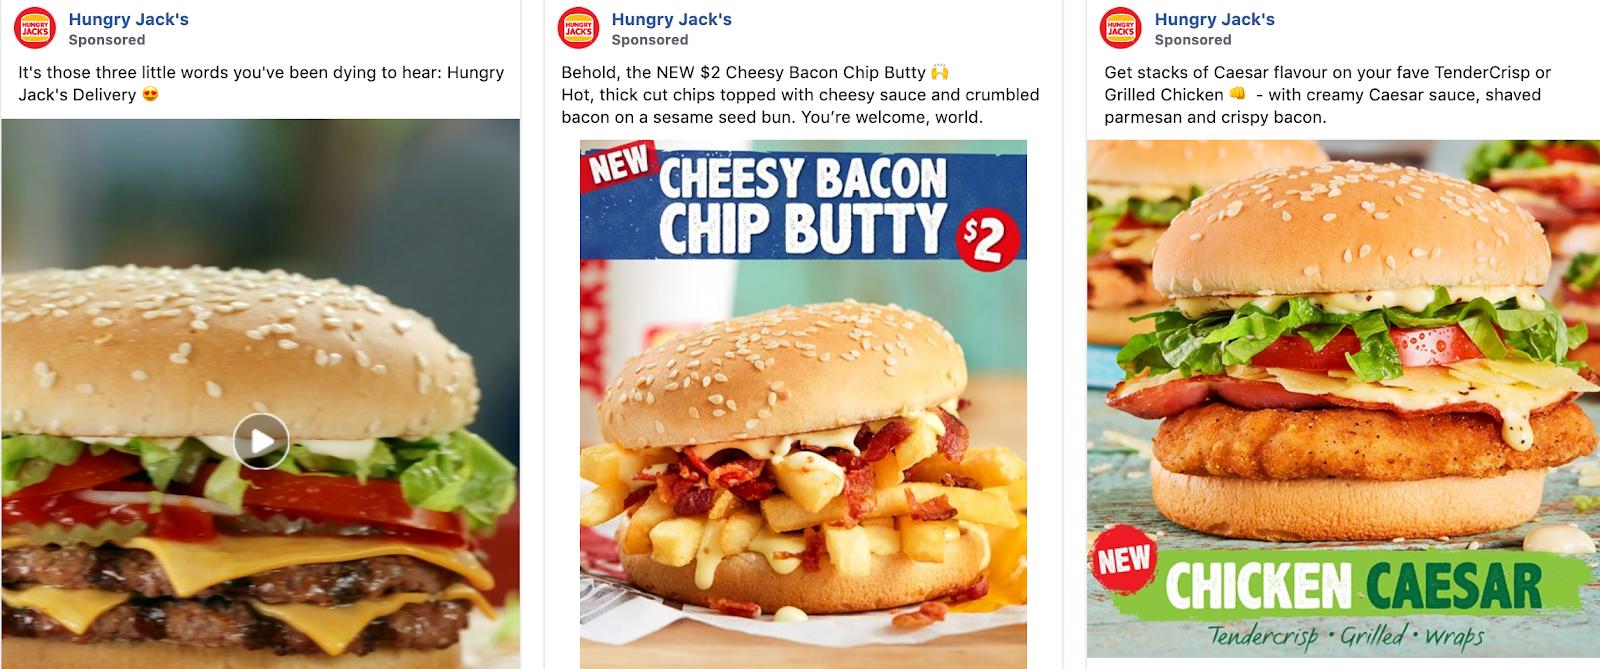 Global Marketing Strategy: Screenshot of Hungry Jack